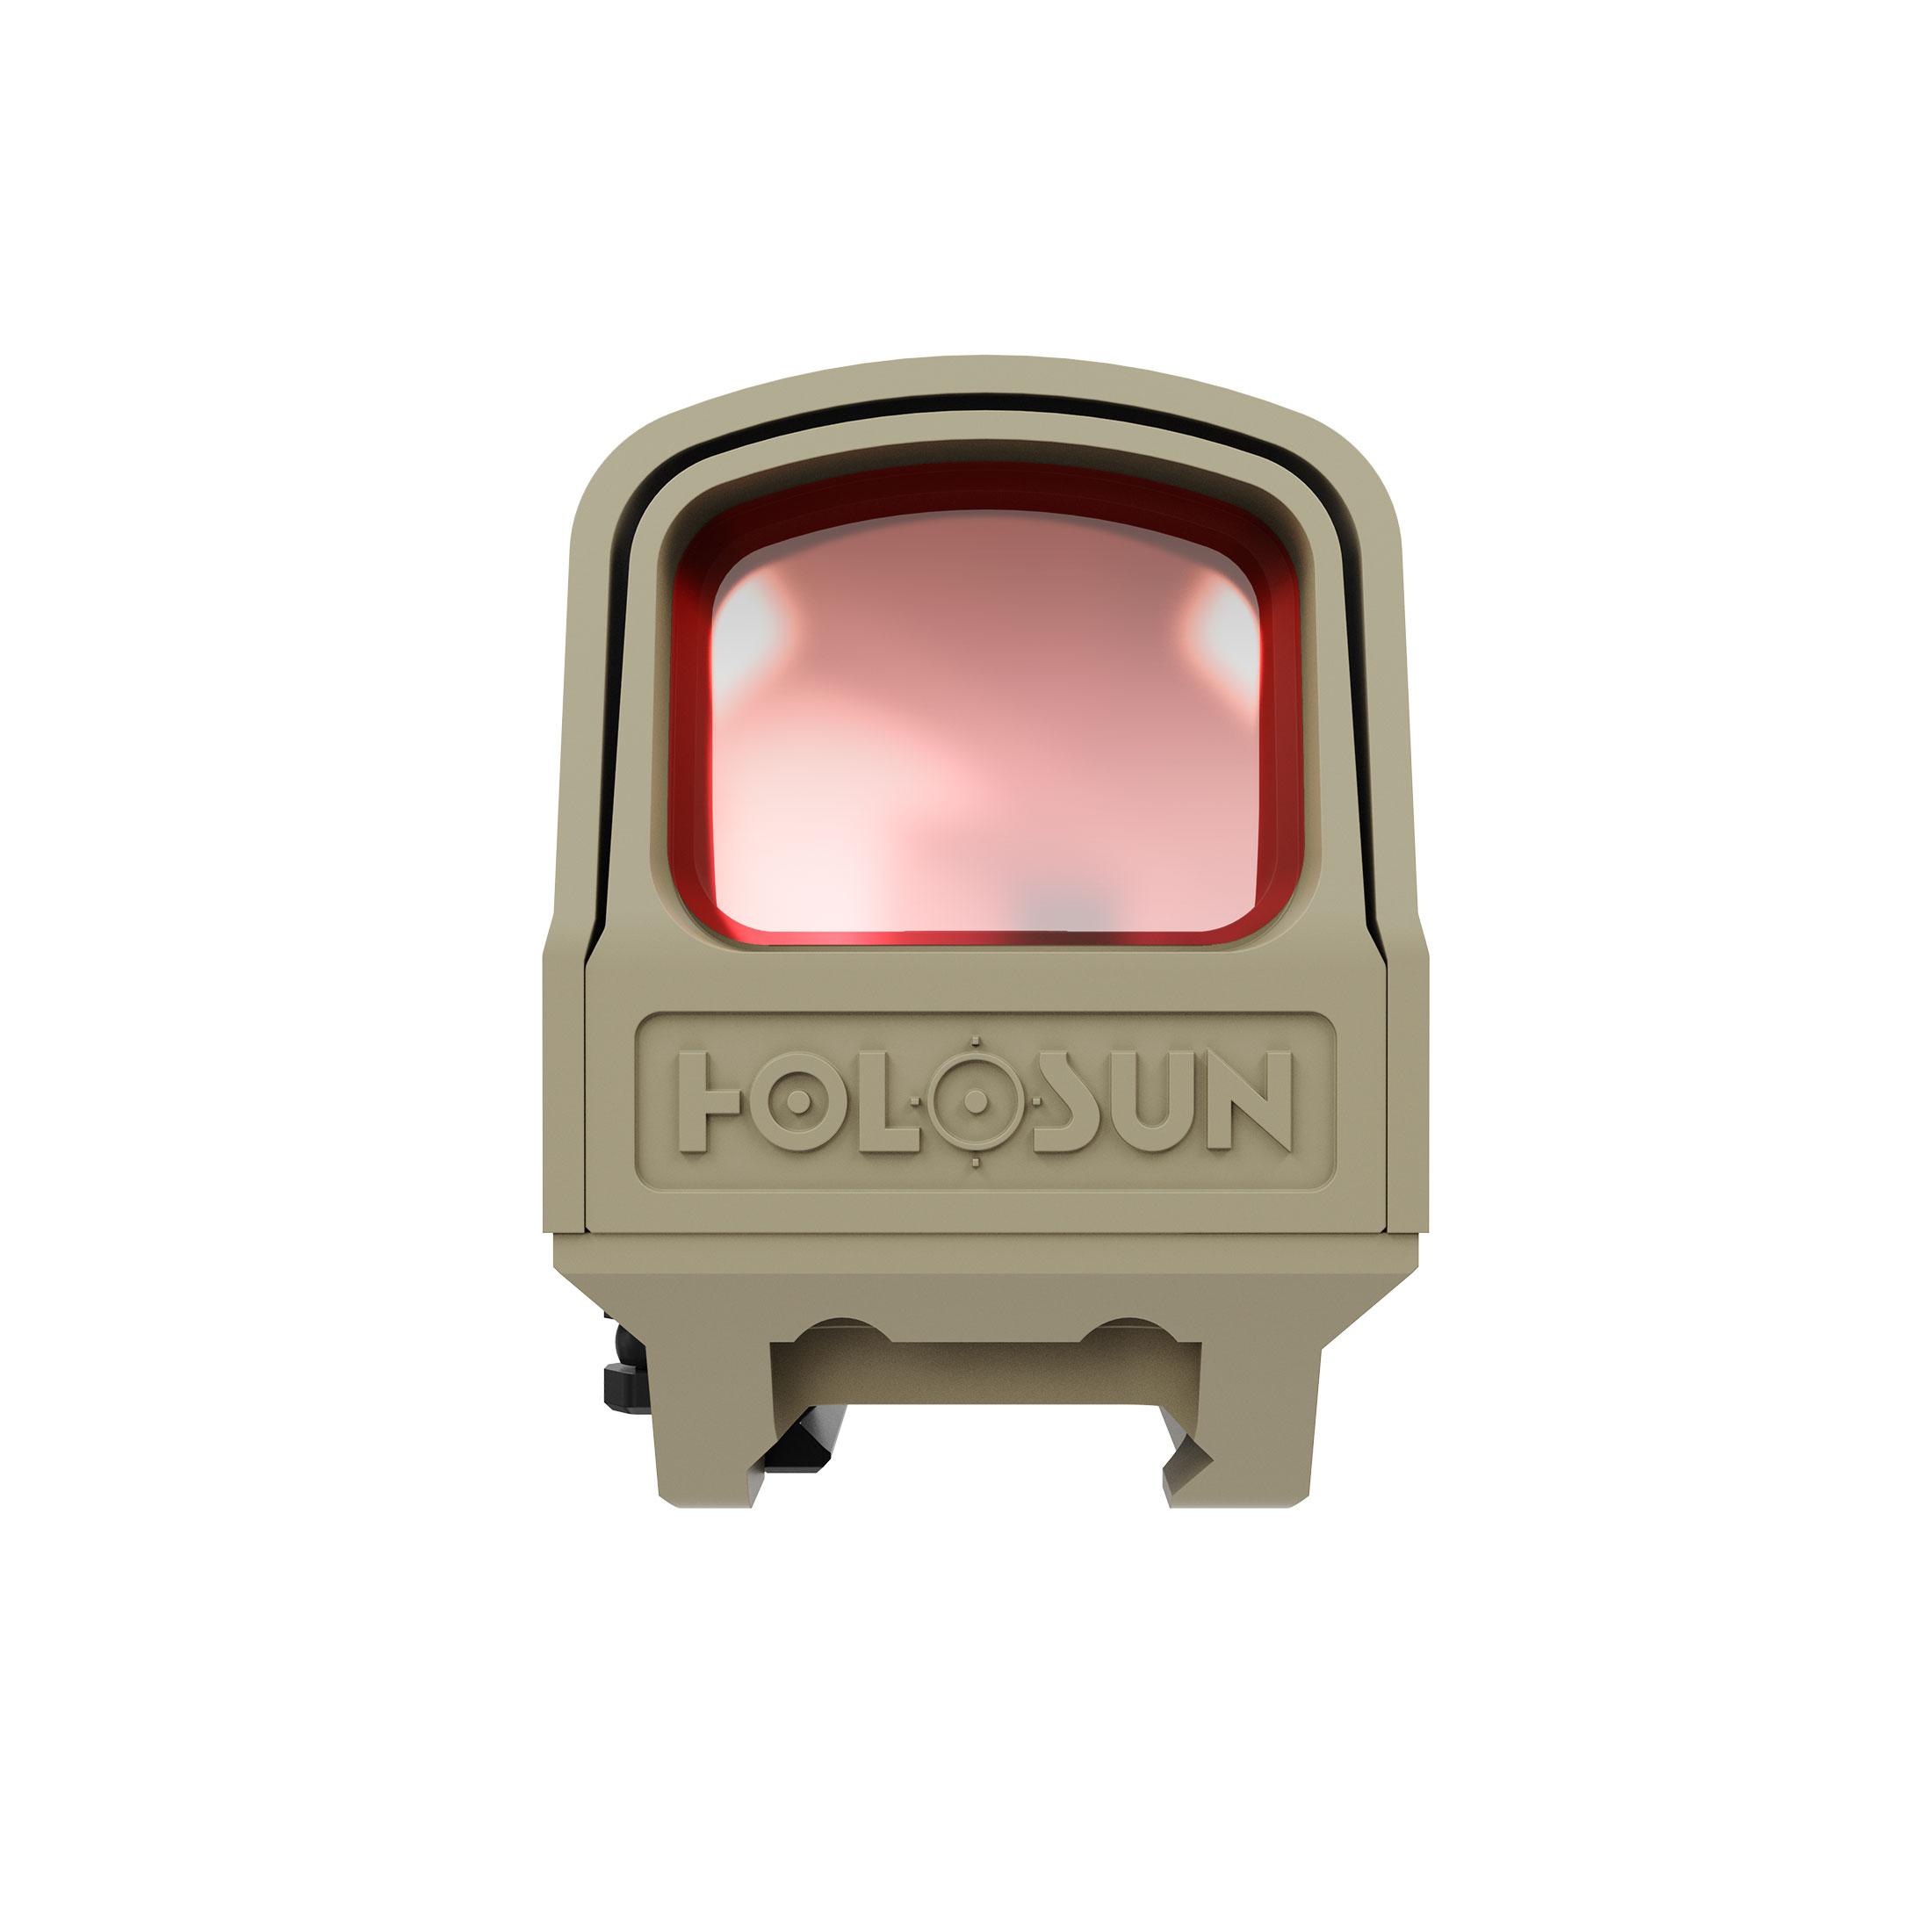 Holosun ELITE HE510C-GR-FDE